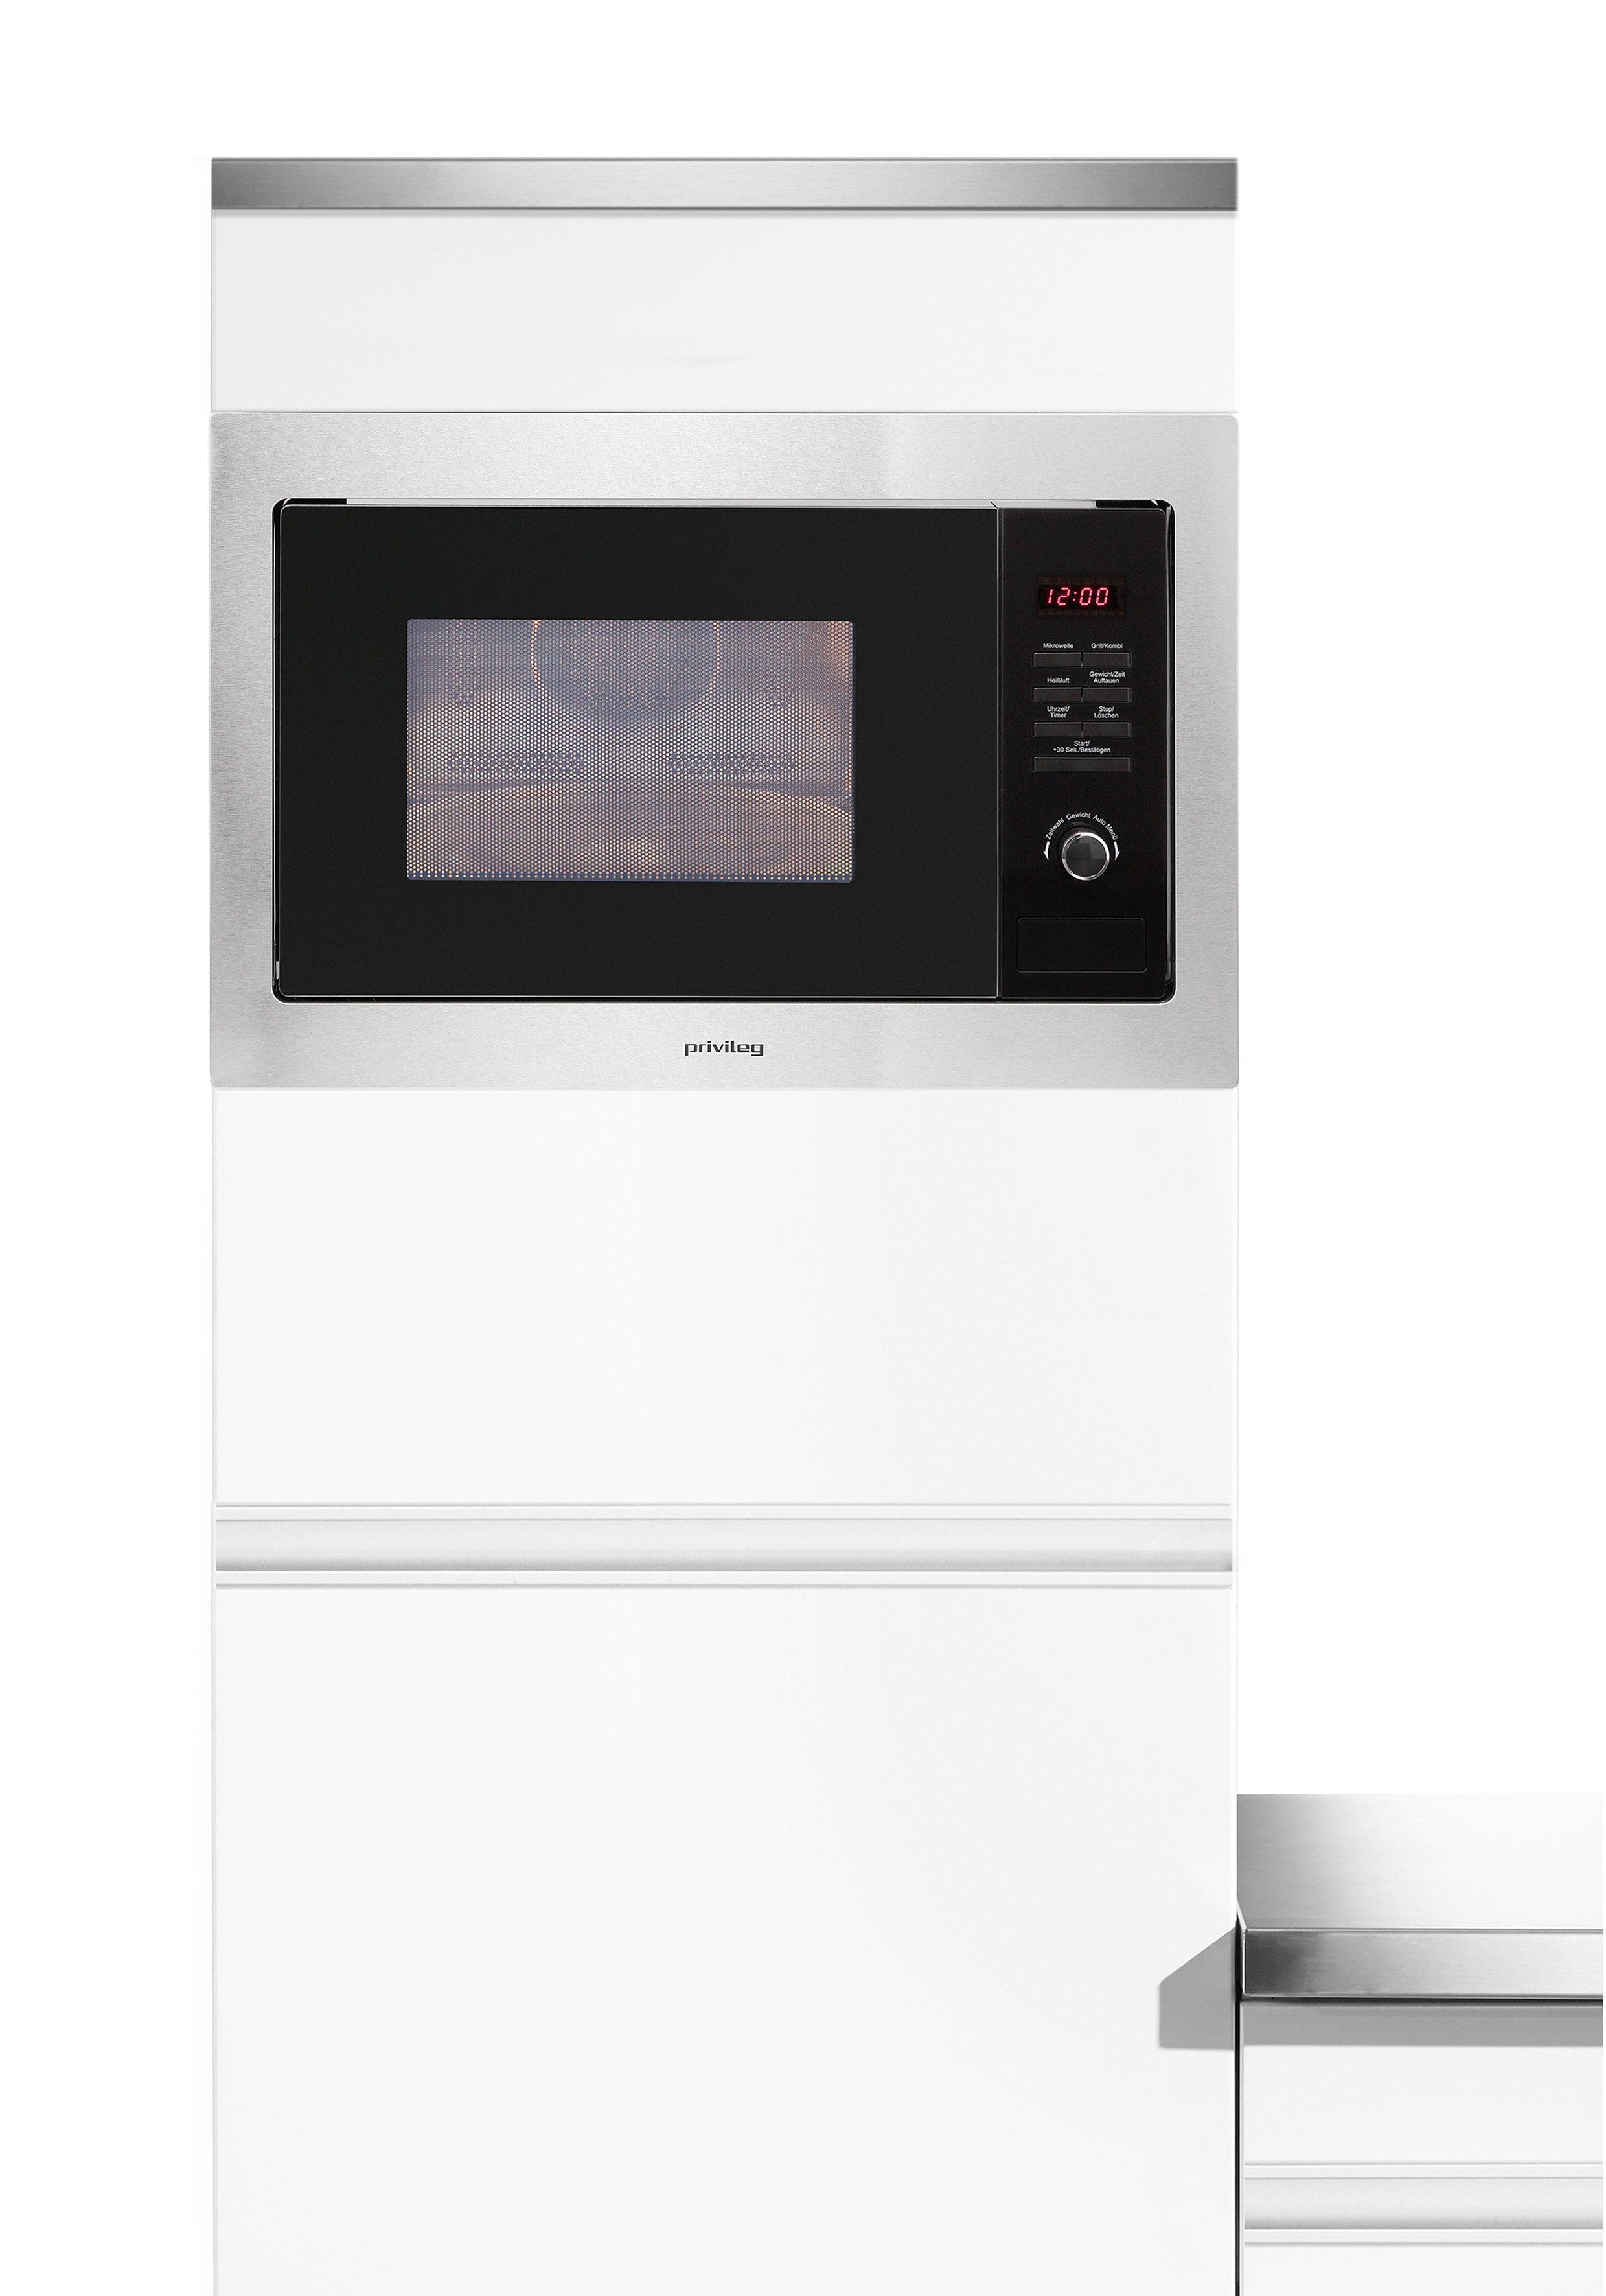 *Privileg Einbau-Mikrowelle »AC 925 BVE«, Mikrowelle, 900 W*